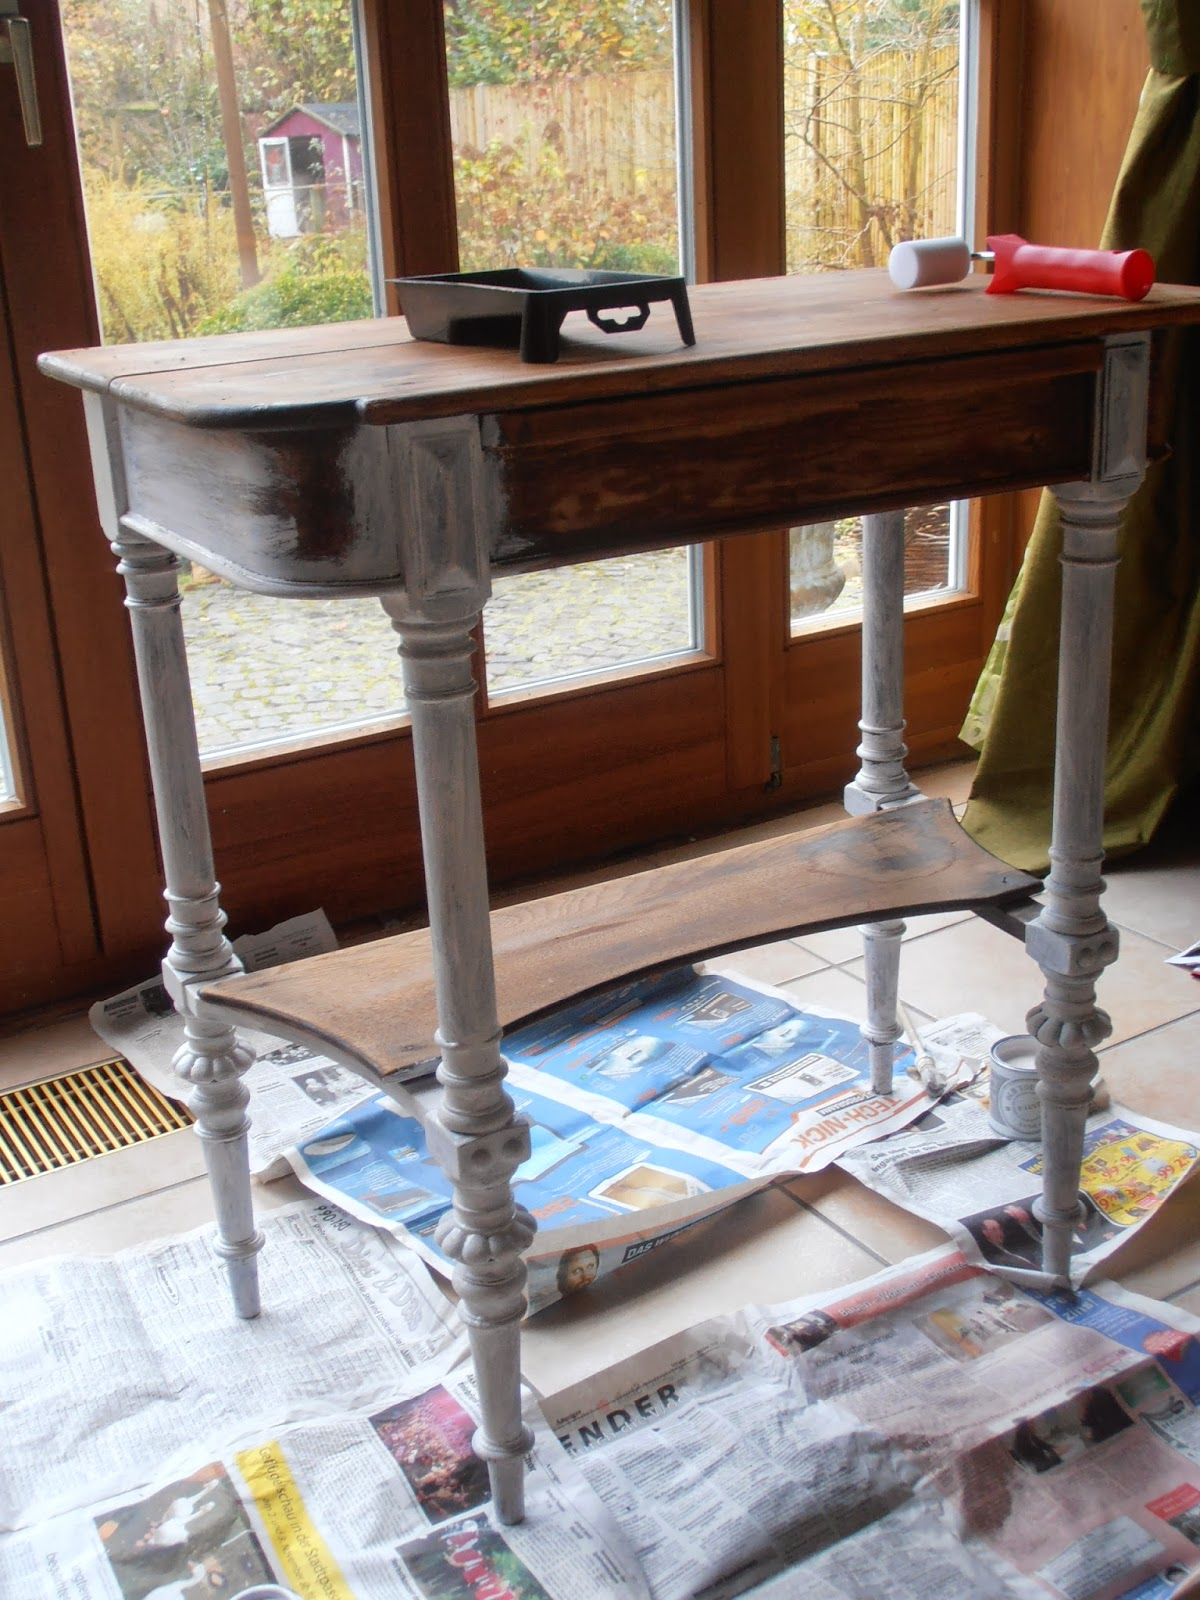 sweet home rosa lia spontaner streichanfall. Black Bedroom Furniture Sets. Home Design Ideas